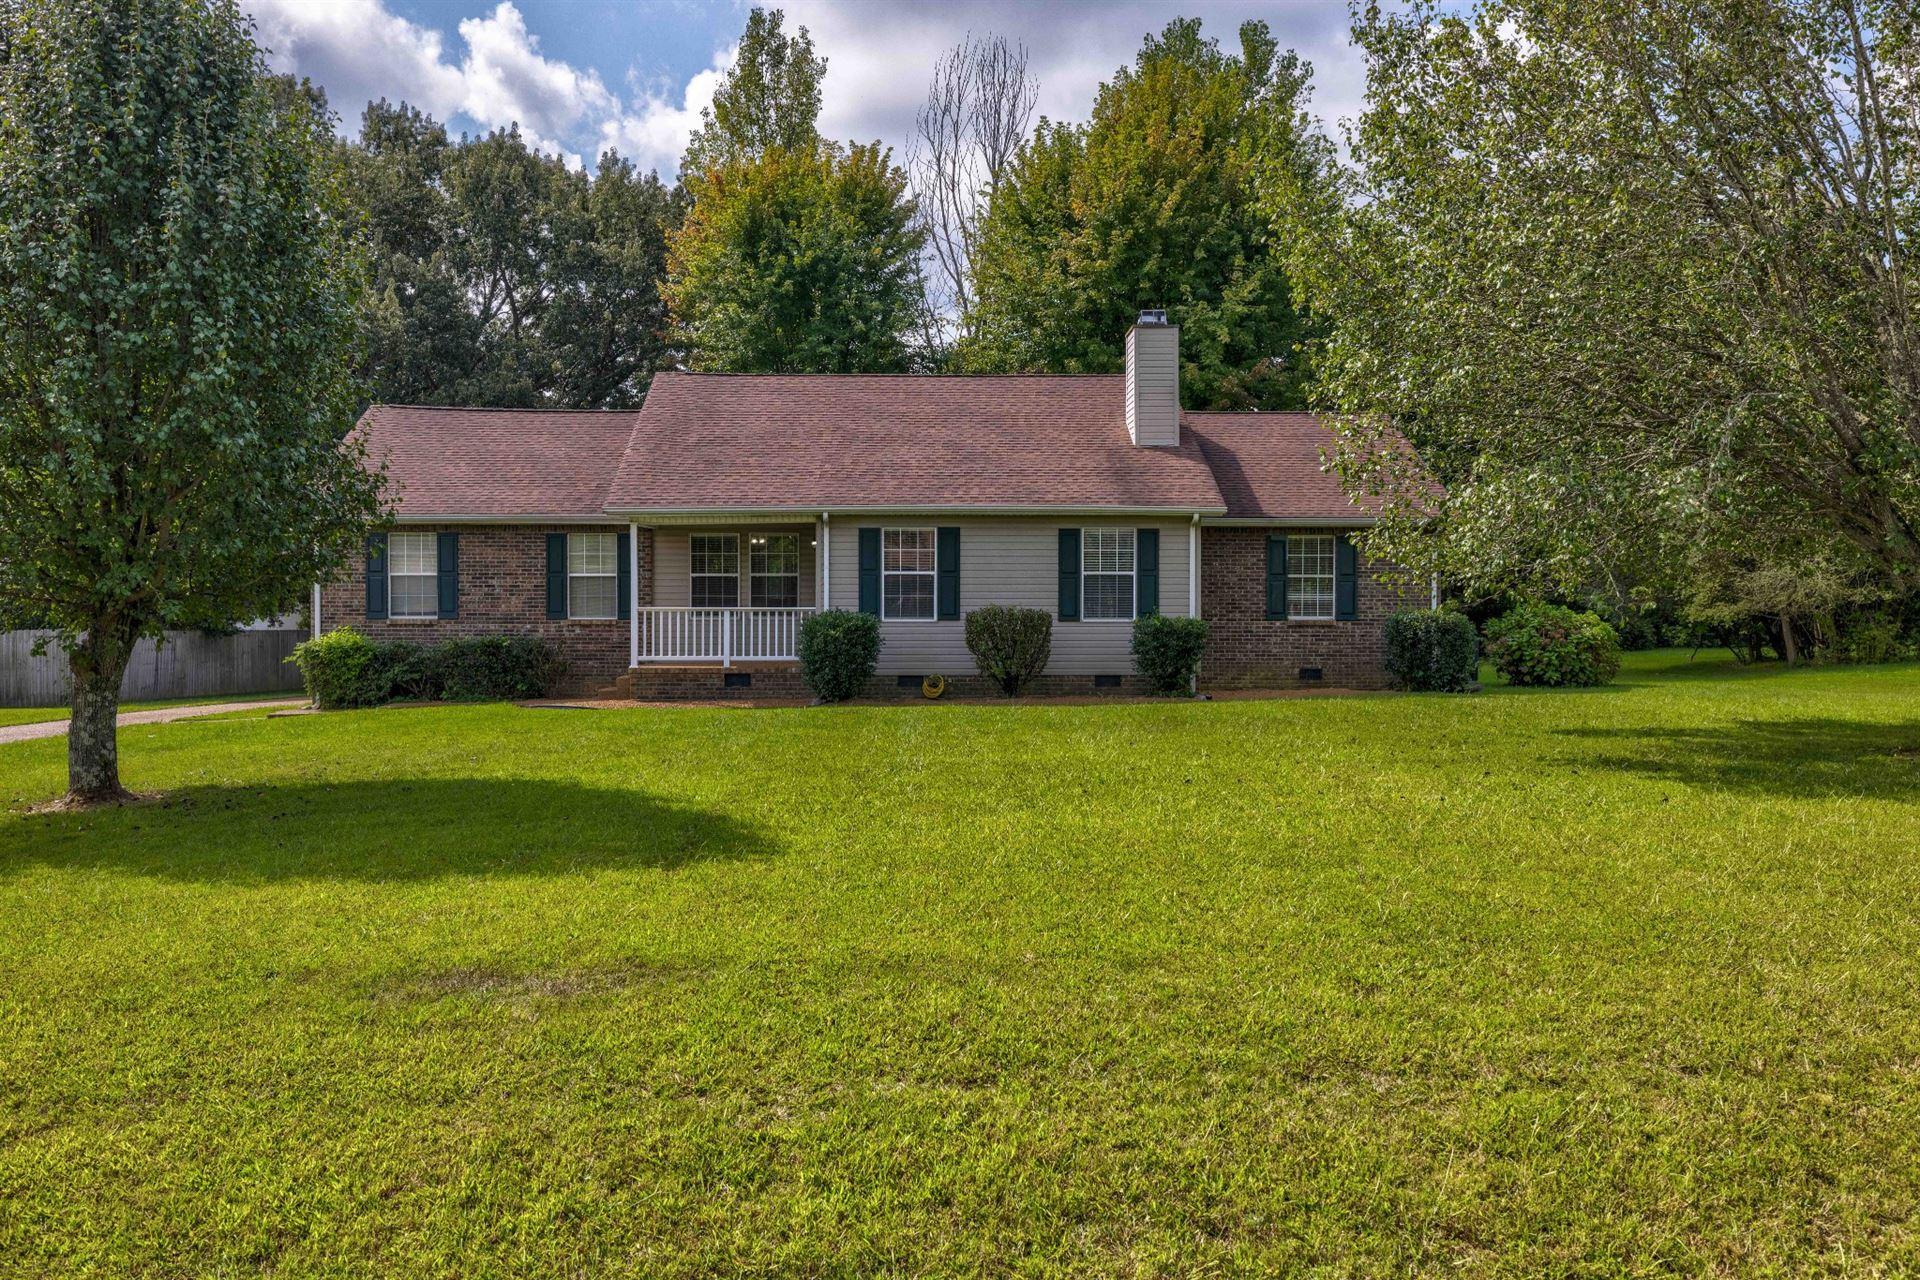 504 Cedar Brook Dr, White House, TN 37188 - MLS#: 2291126